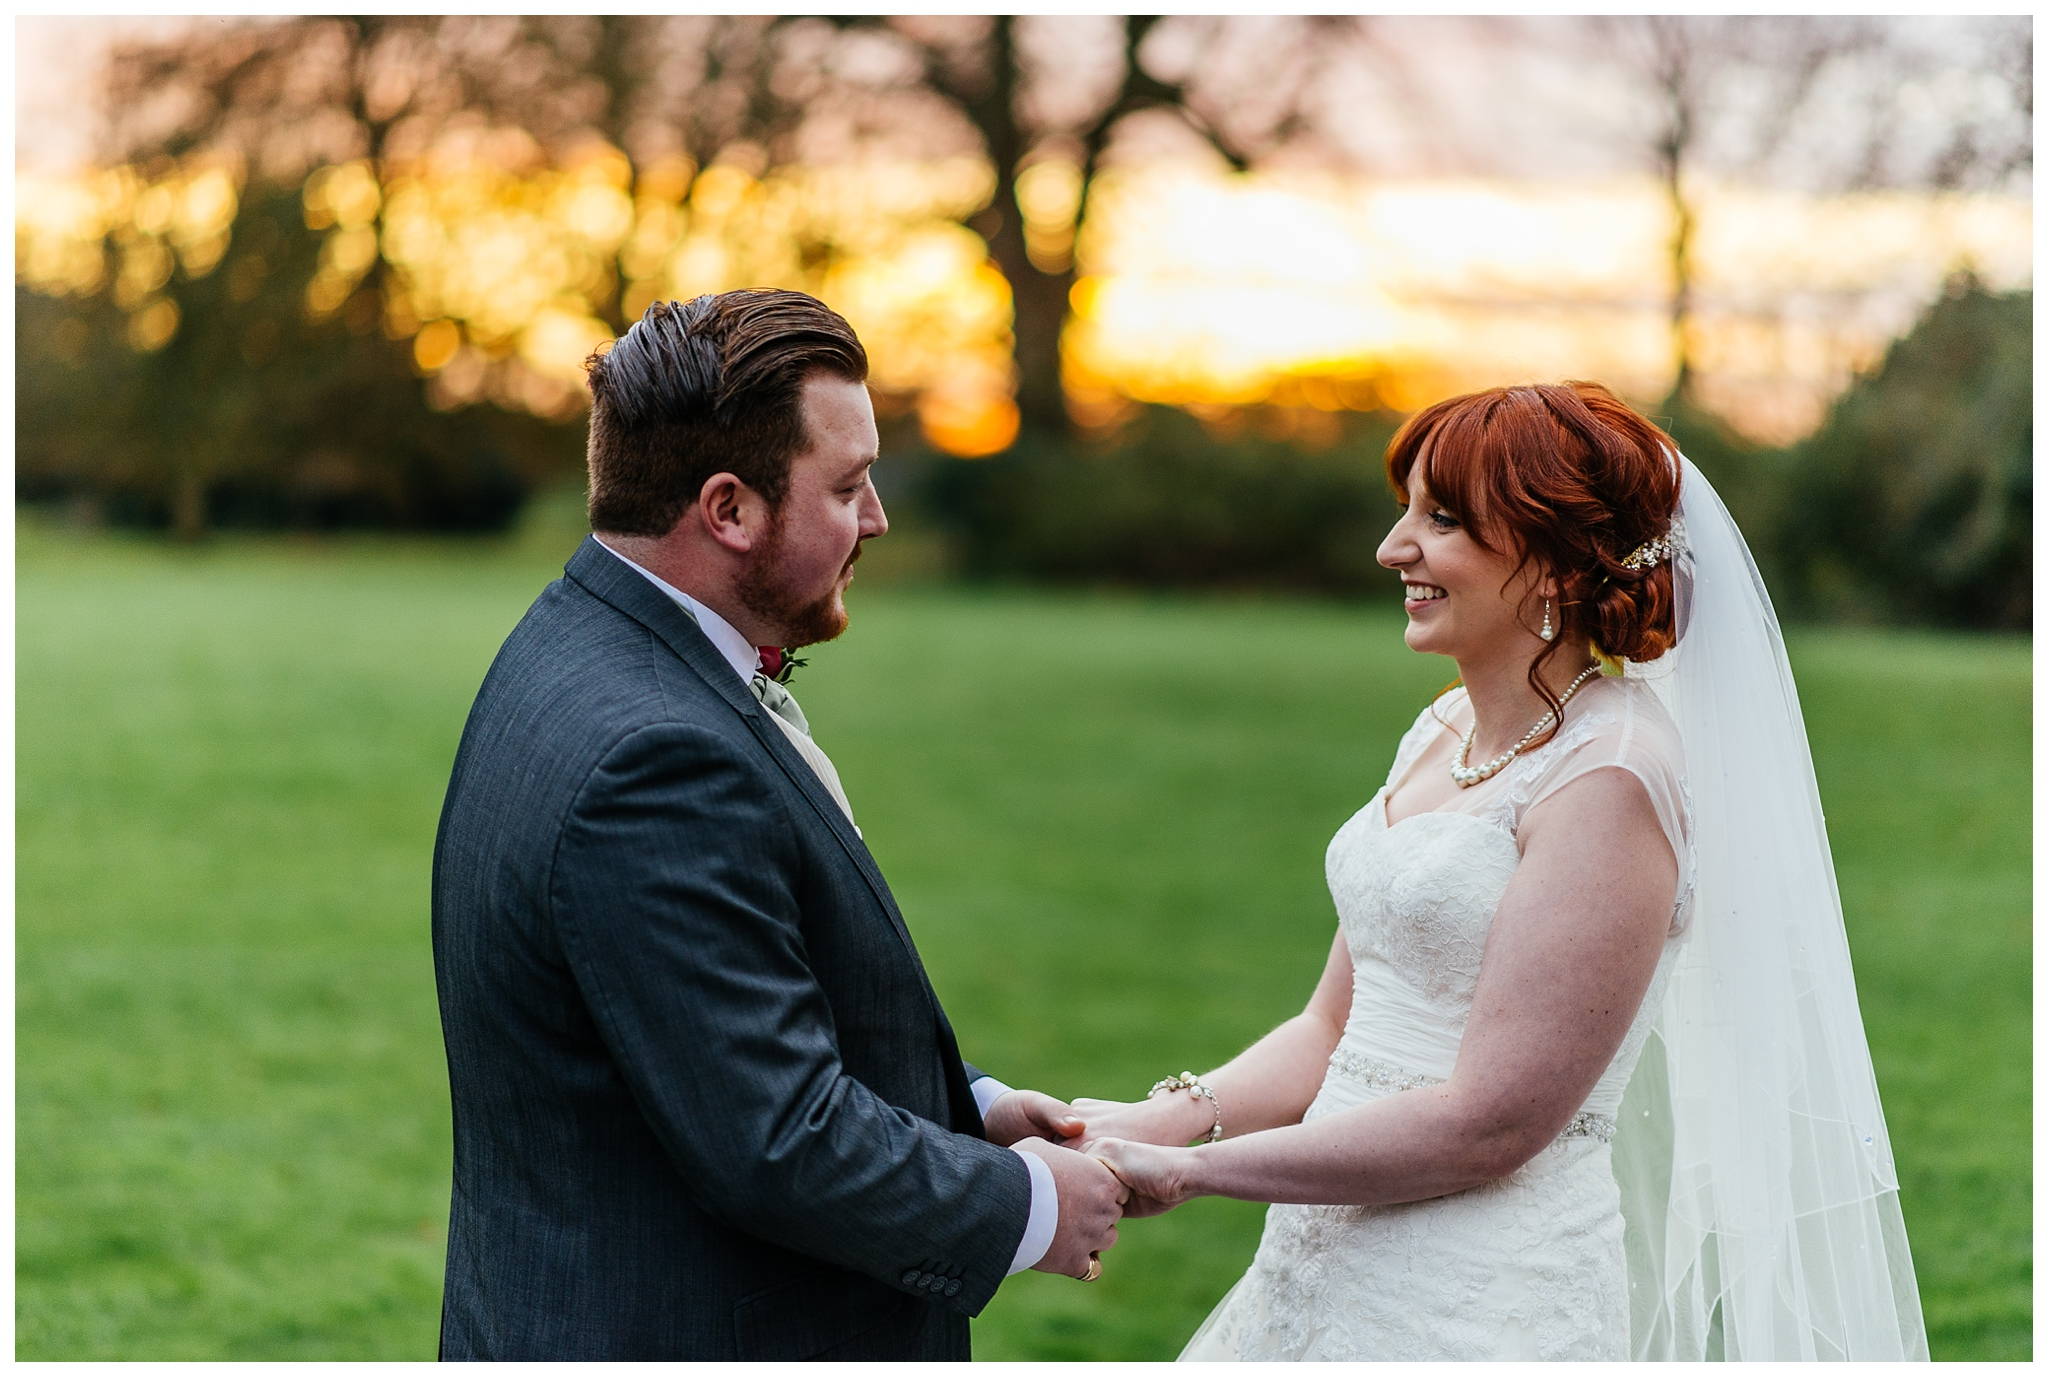 Emma&Paul-Elmore-Court-Winter-Wedding-Nikki-Cooper-Photography_0064.jpg